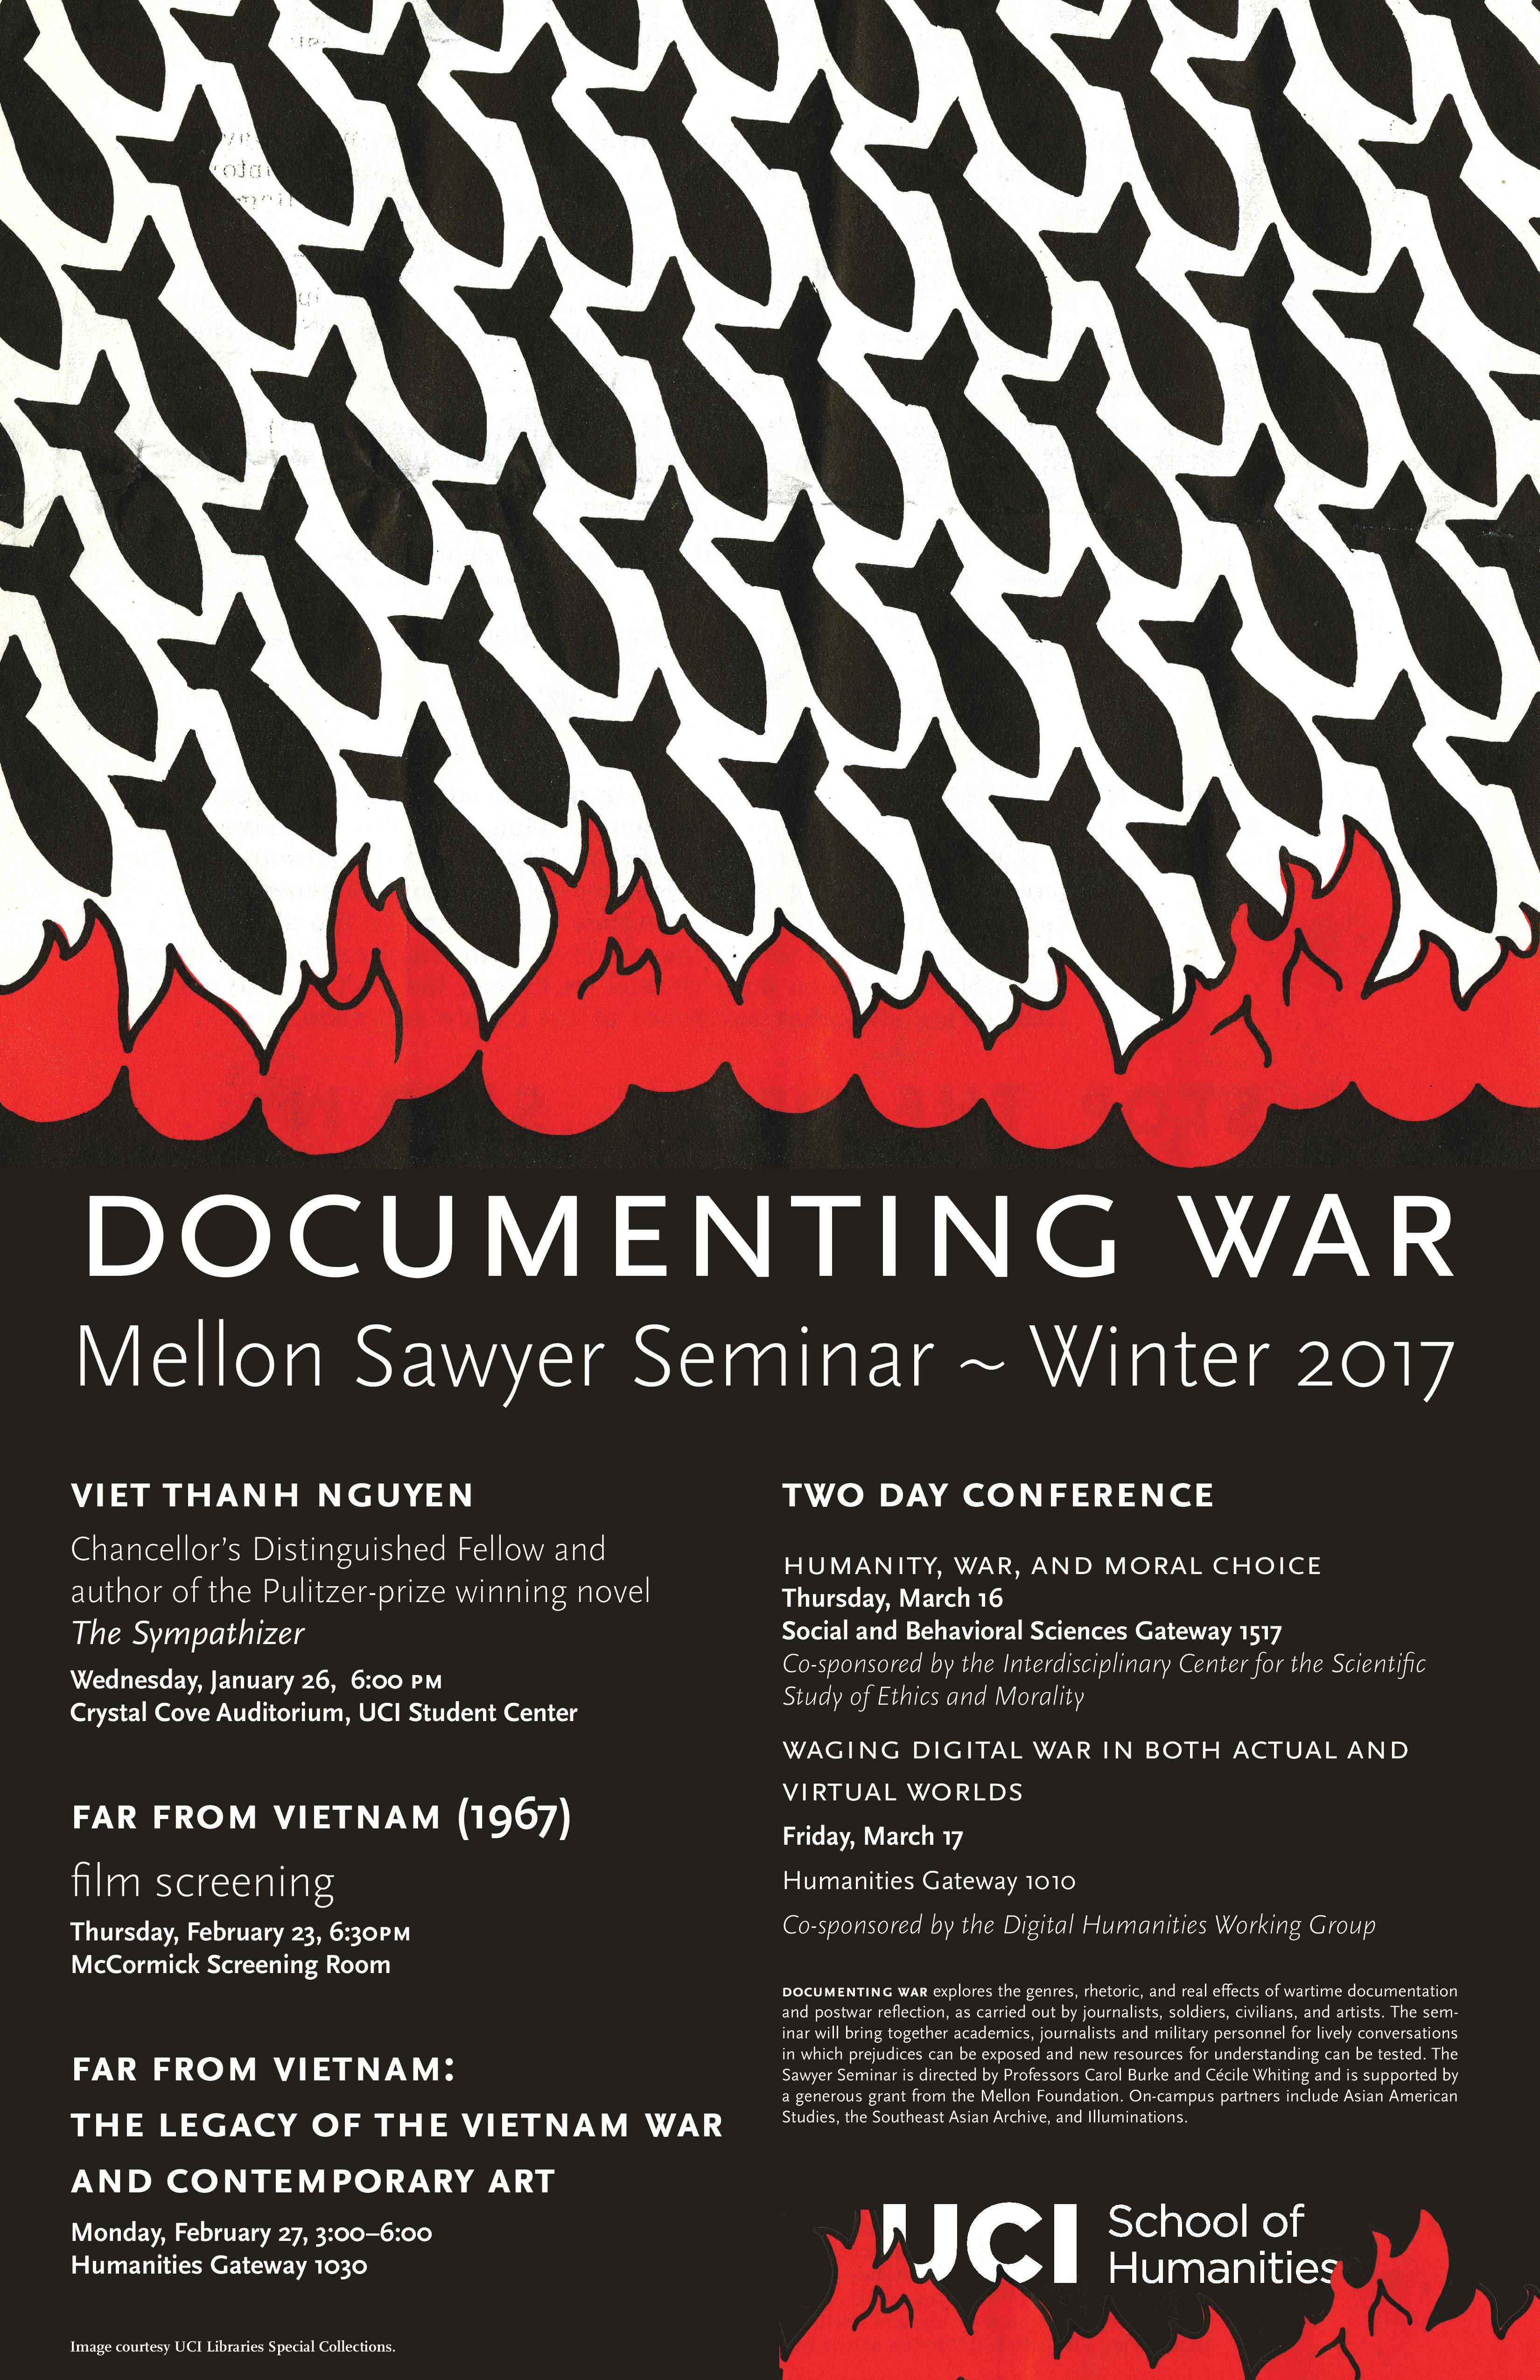 sawyer_seminar_winter_2016_poster-page-001